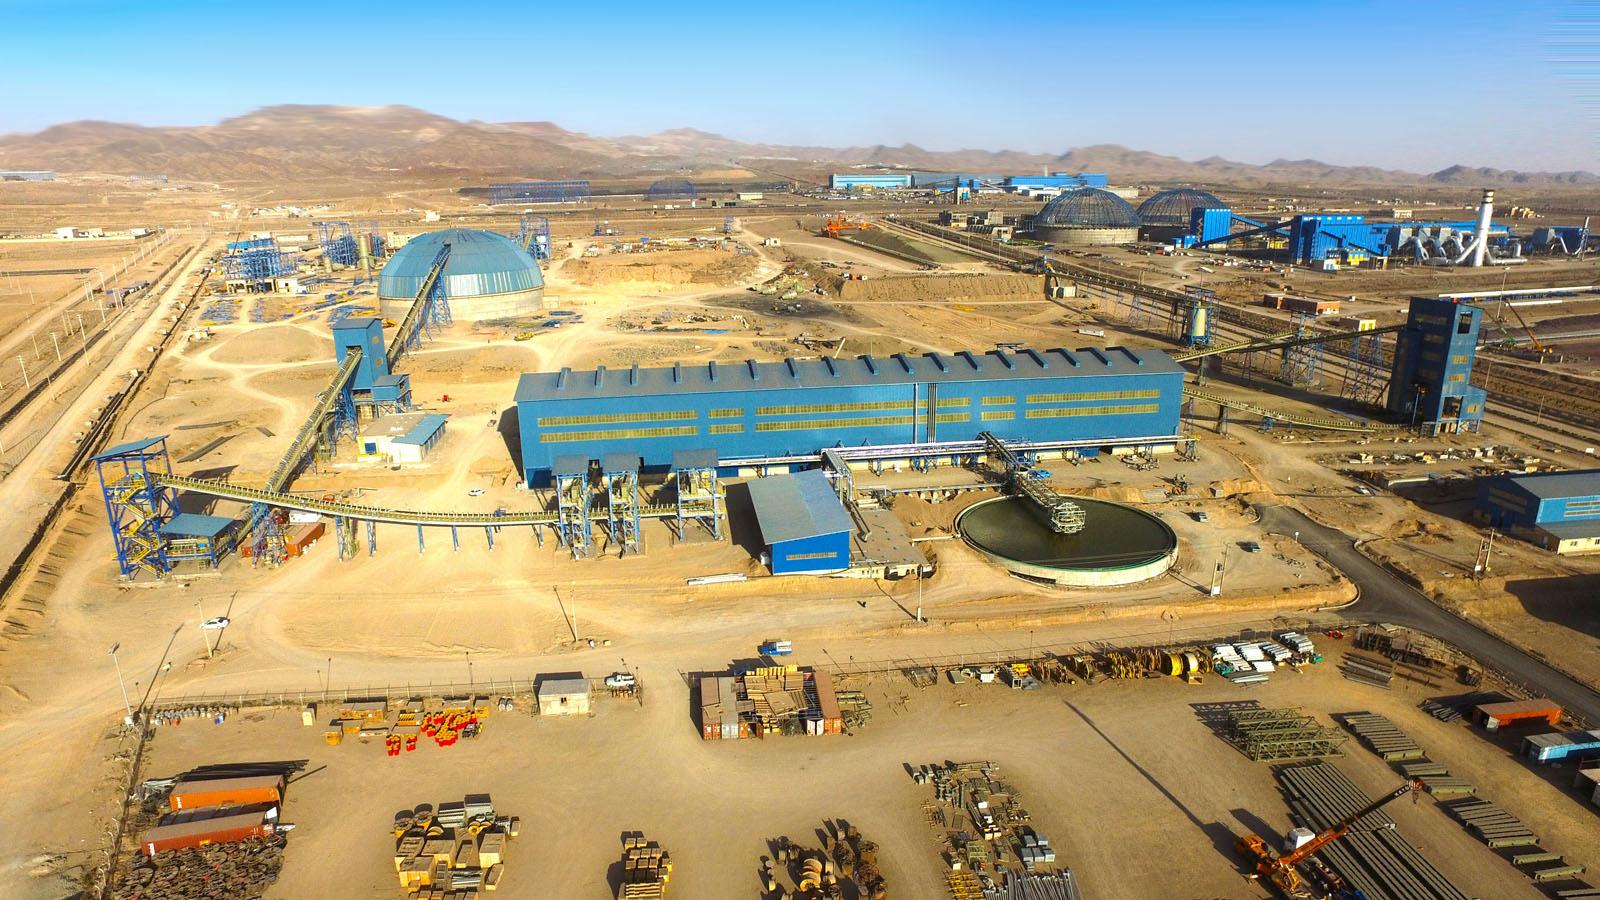 Iron Ore Pelletizing Plant of Sangan Mining Co